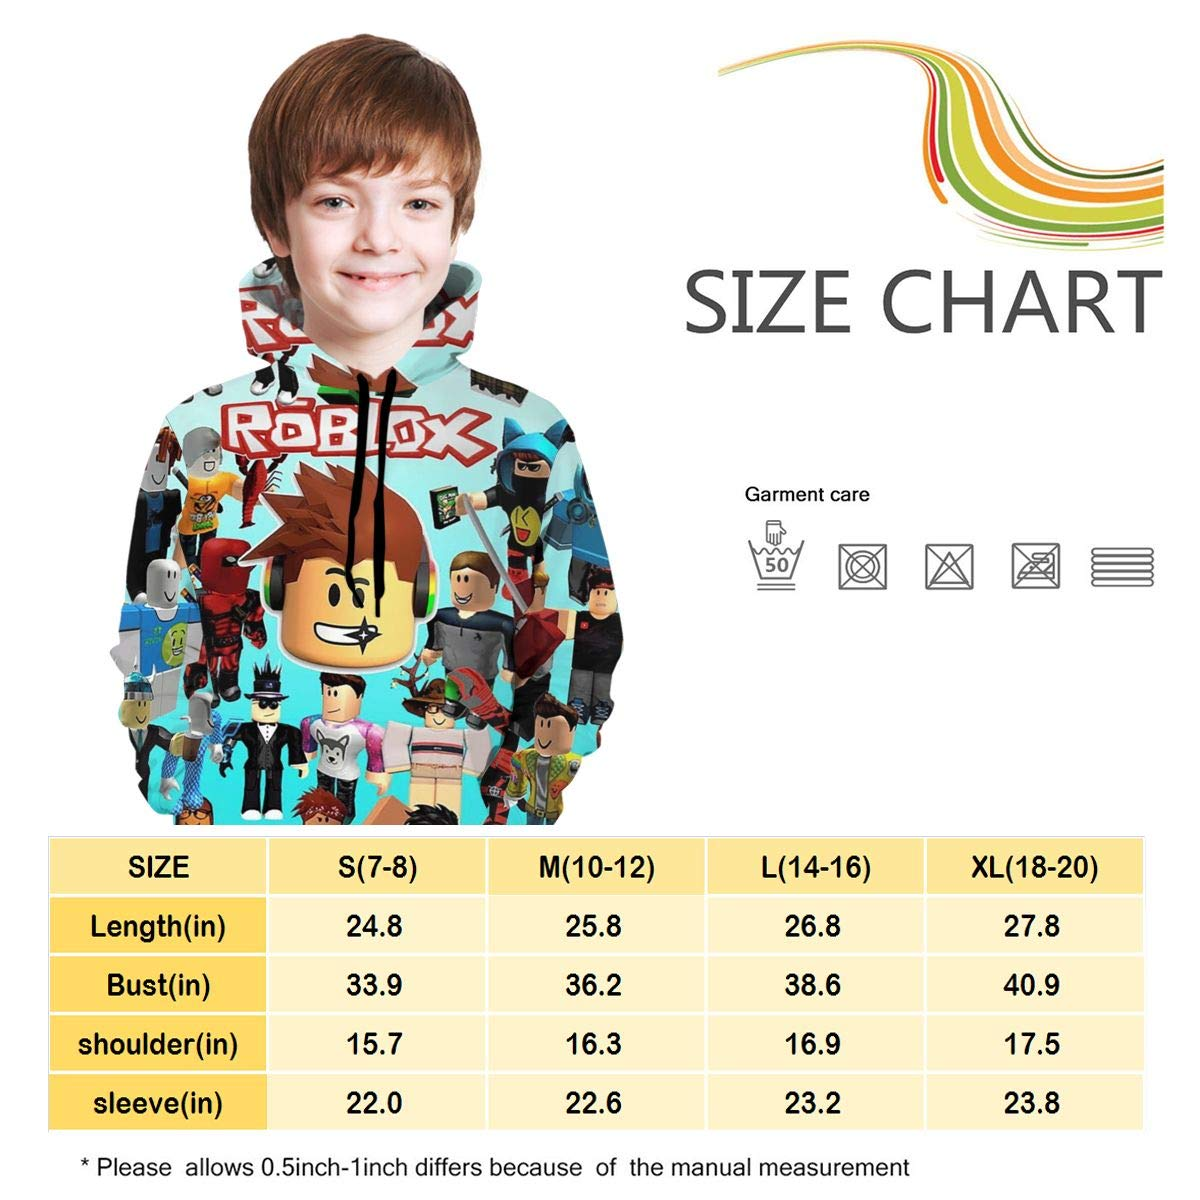 Chuangyitongxun Childrens Hoodies Ro-blox 3D Print Unisex Pullover Hooded Sweatshirts for Boys Girls Teen Kids